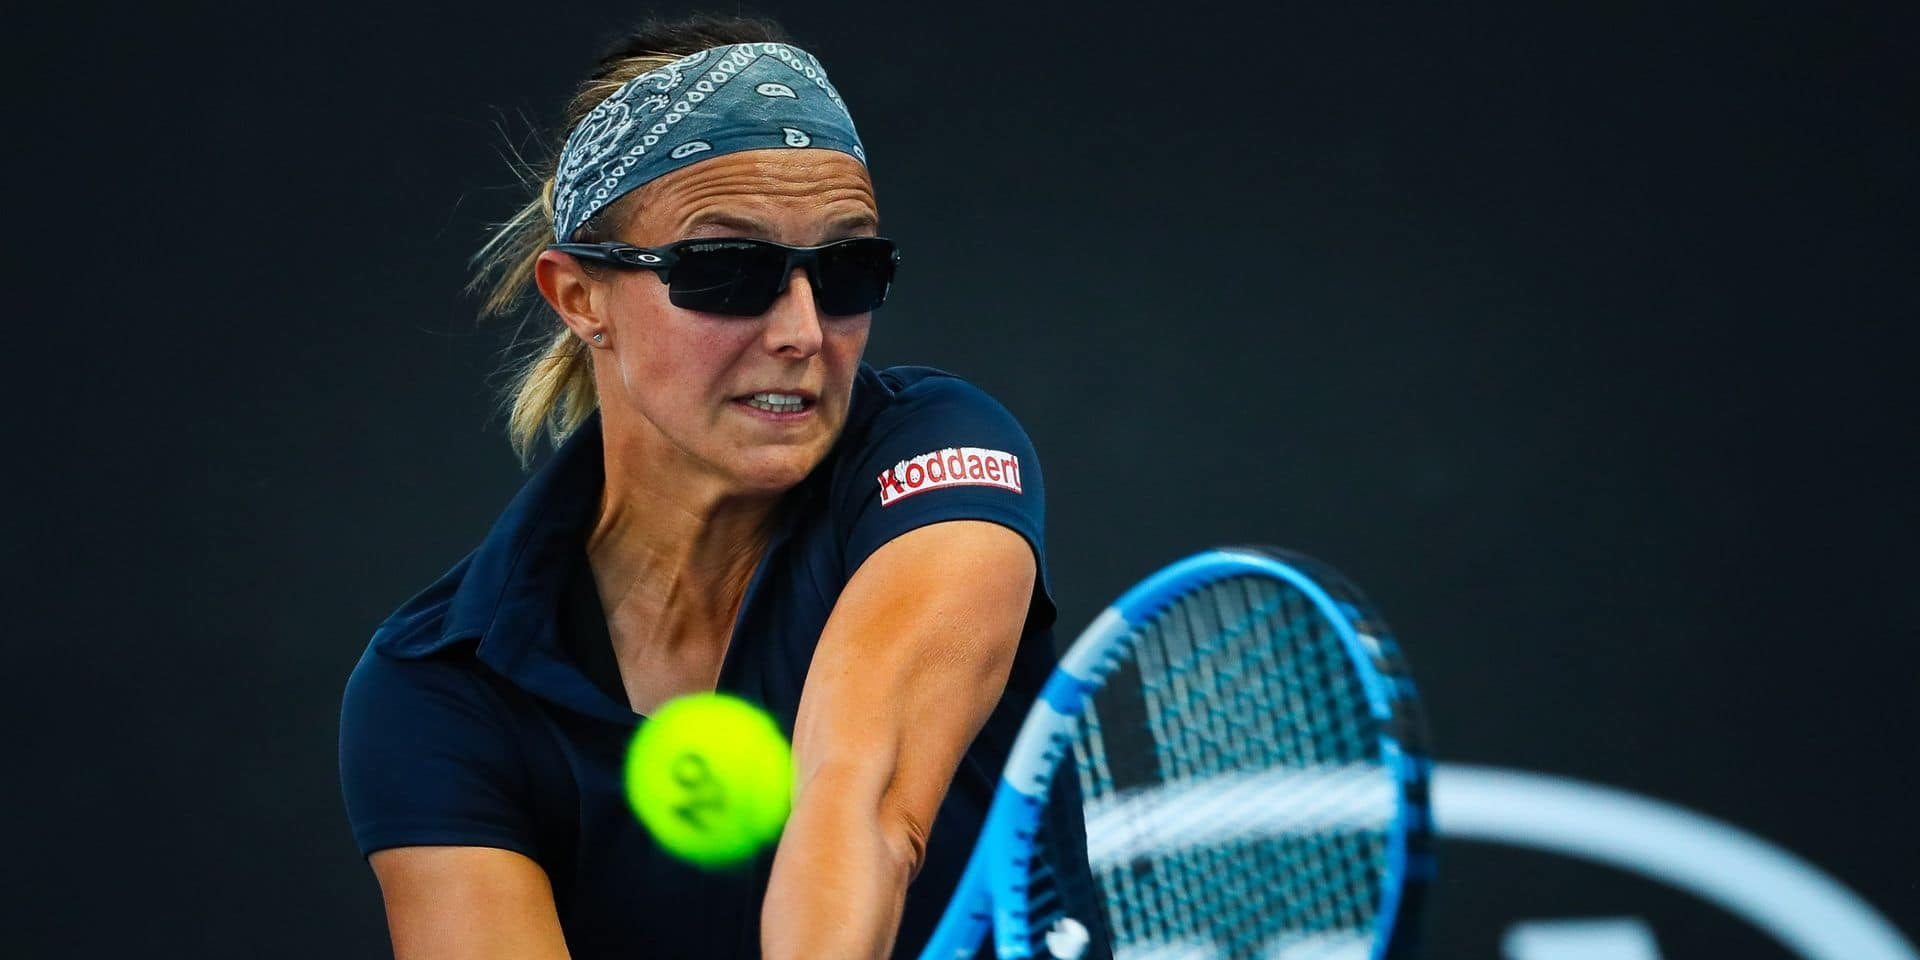 WTA Cincinnati : Flipkens, Minnen et Bonaventure jouent les qualifications ce jeudi